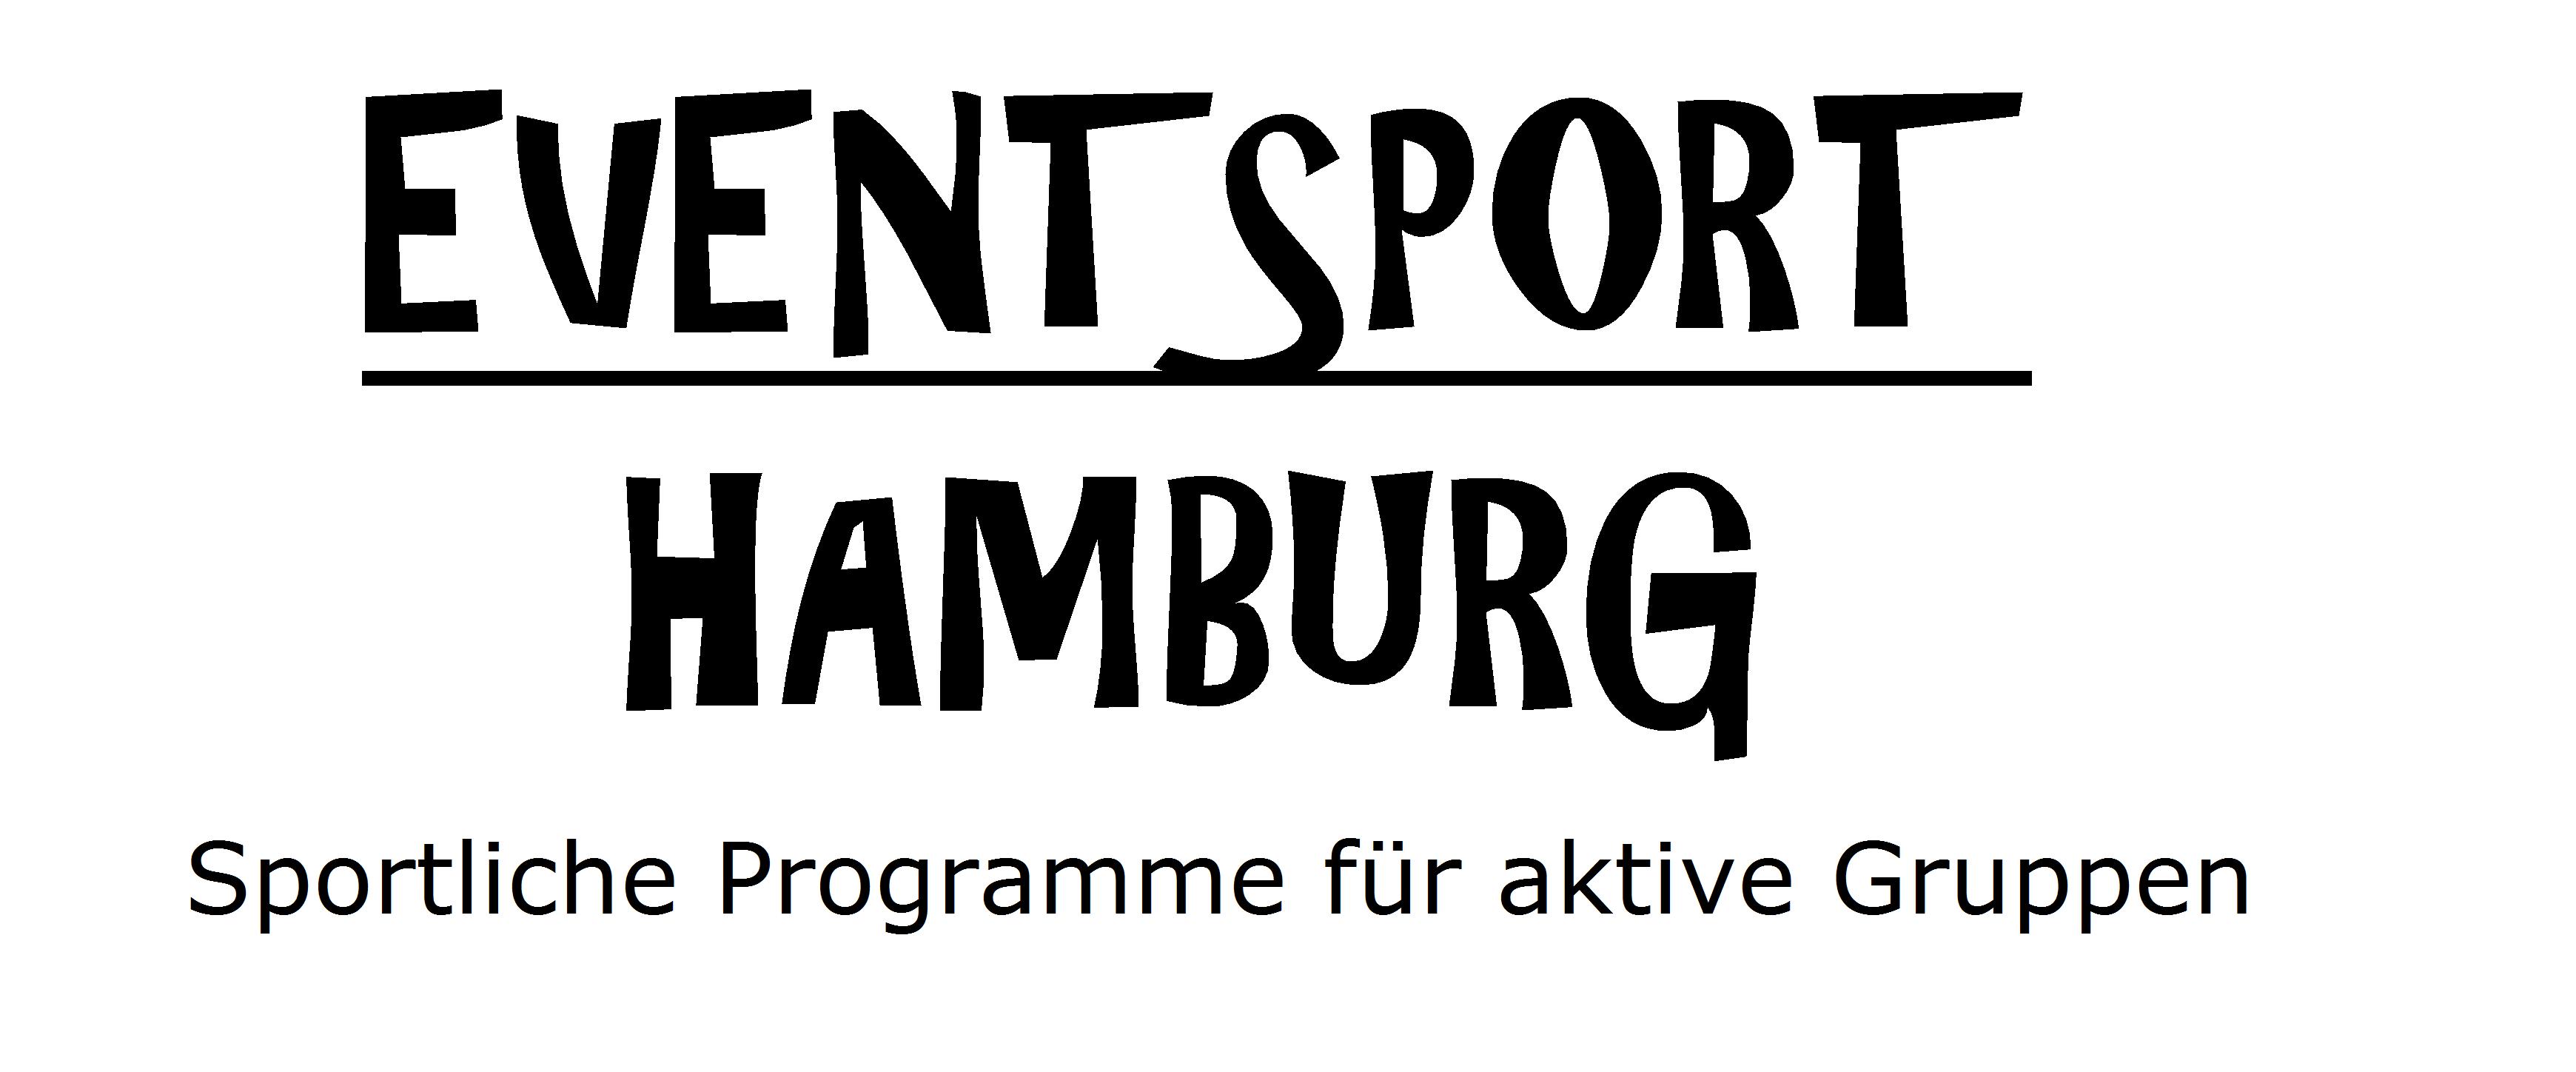 Eventsport-Hamburg.de